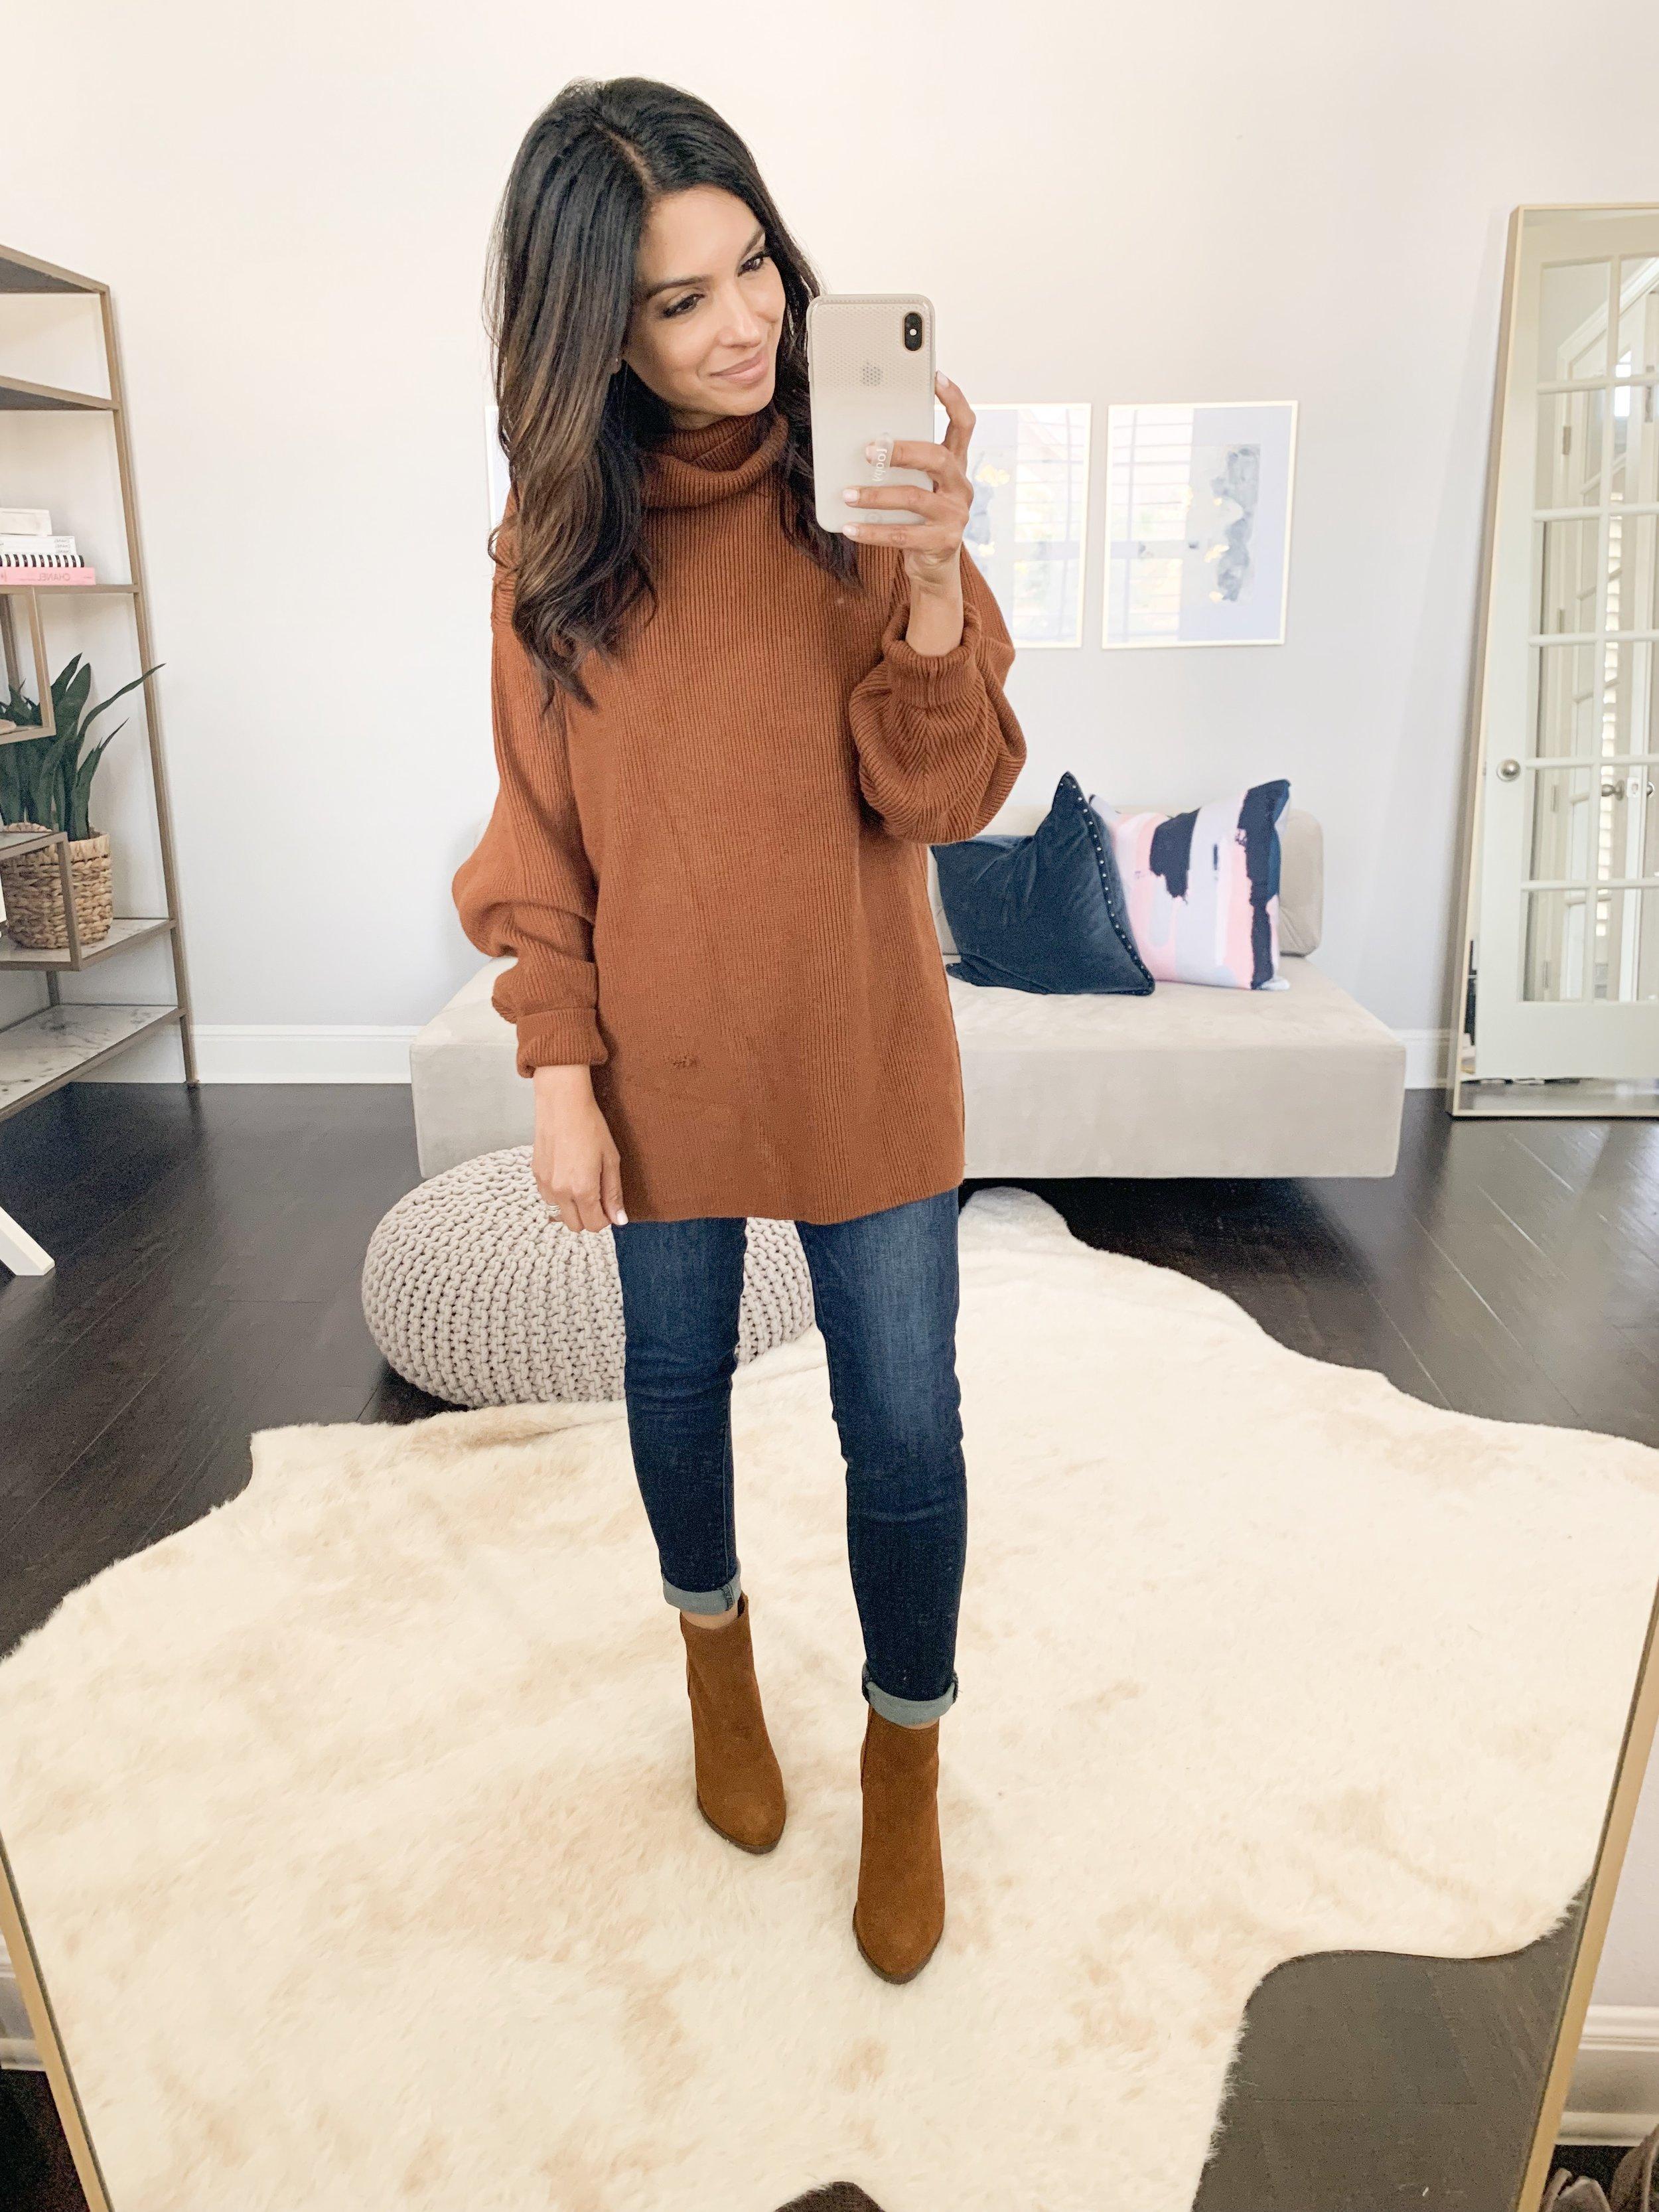 Tunic Sweater (XS) // Jeans (TTS) // Booties (TTS)